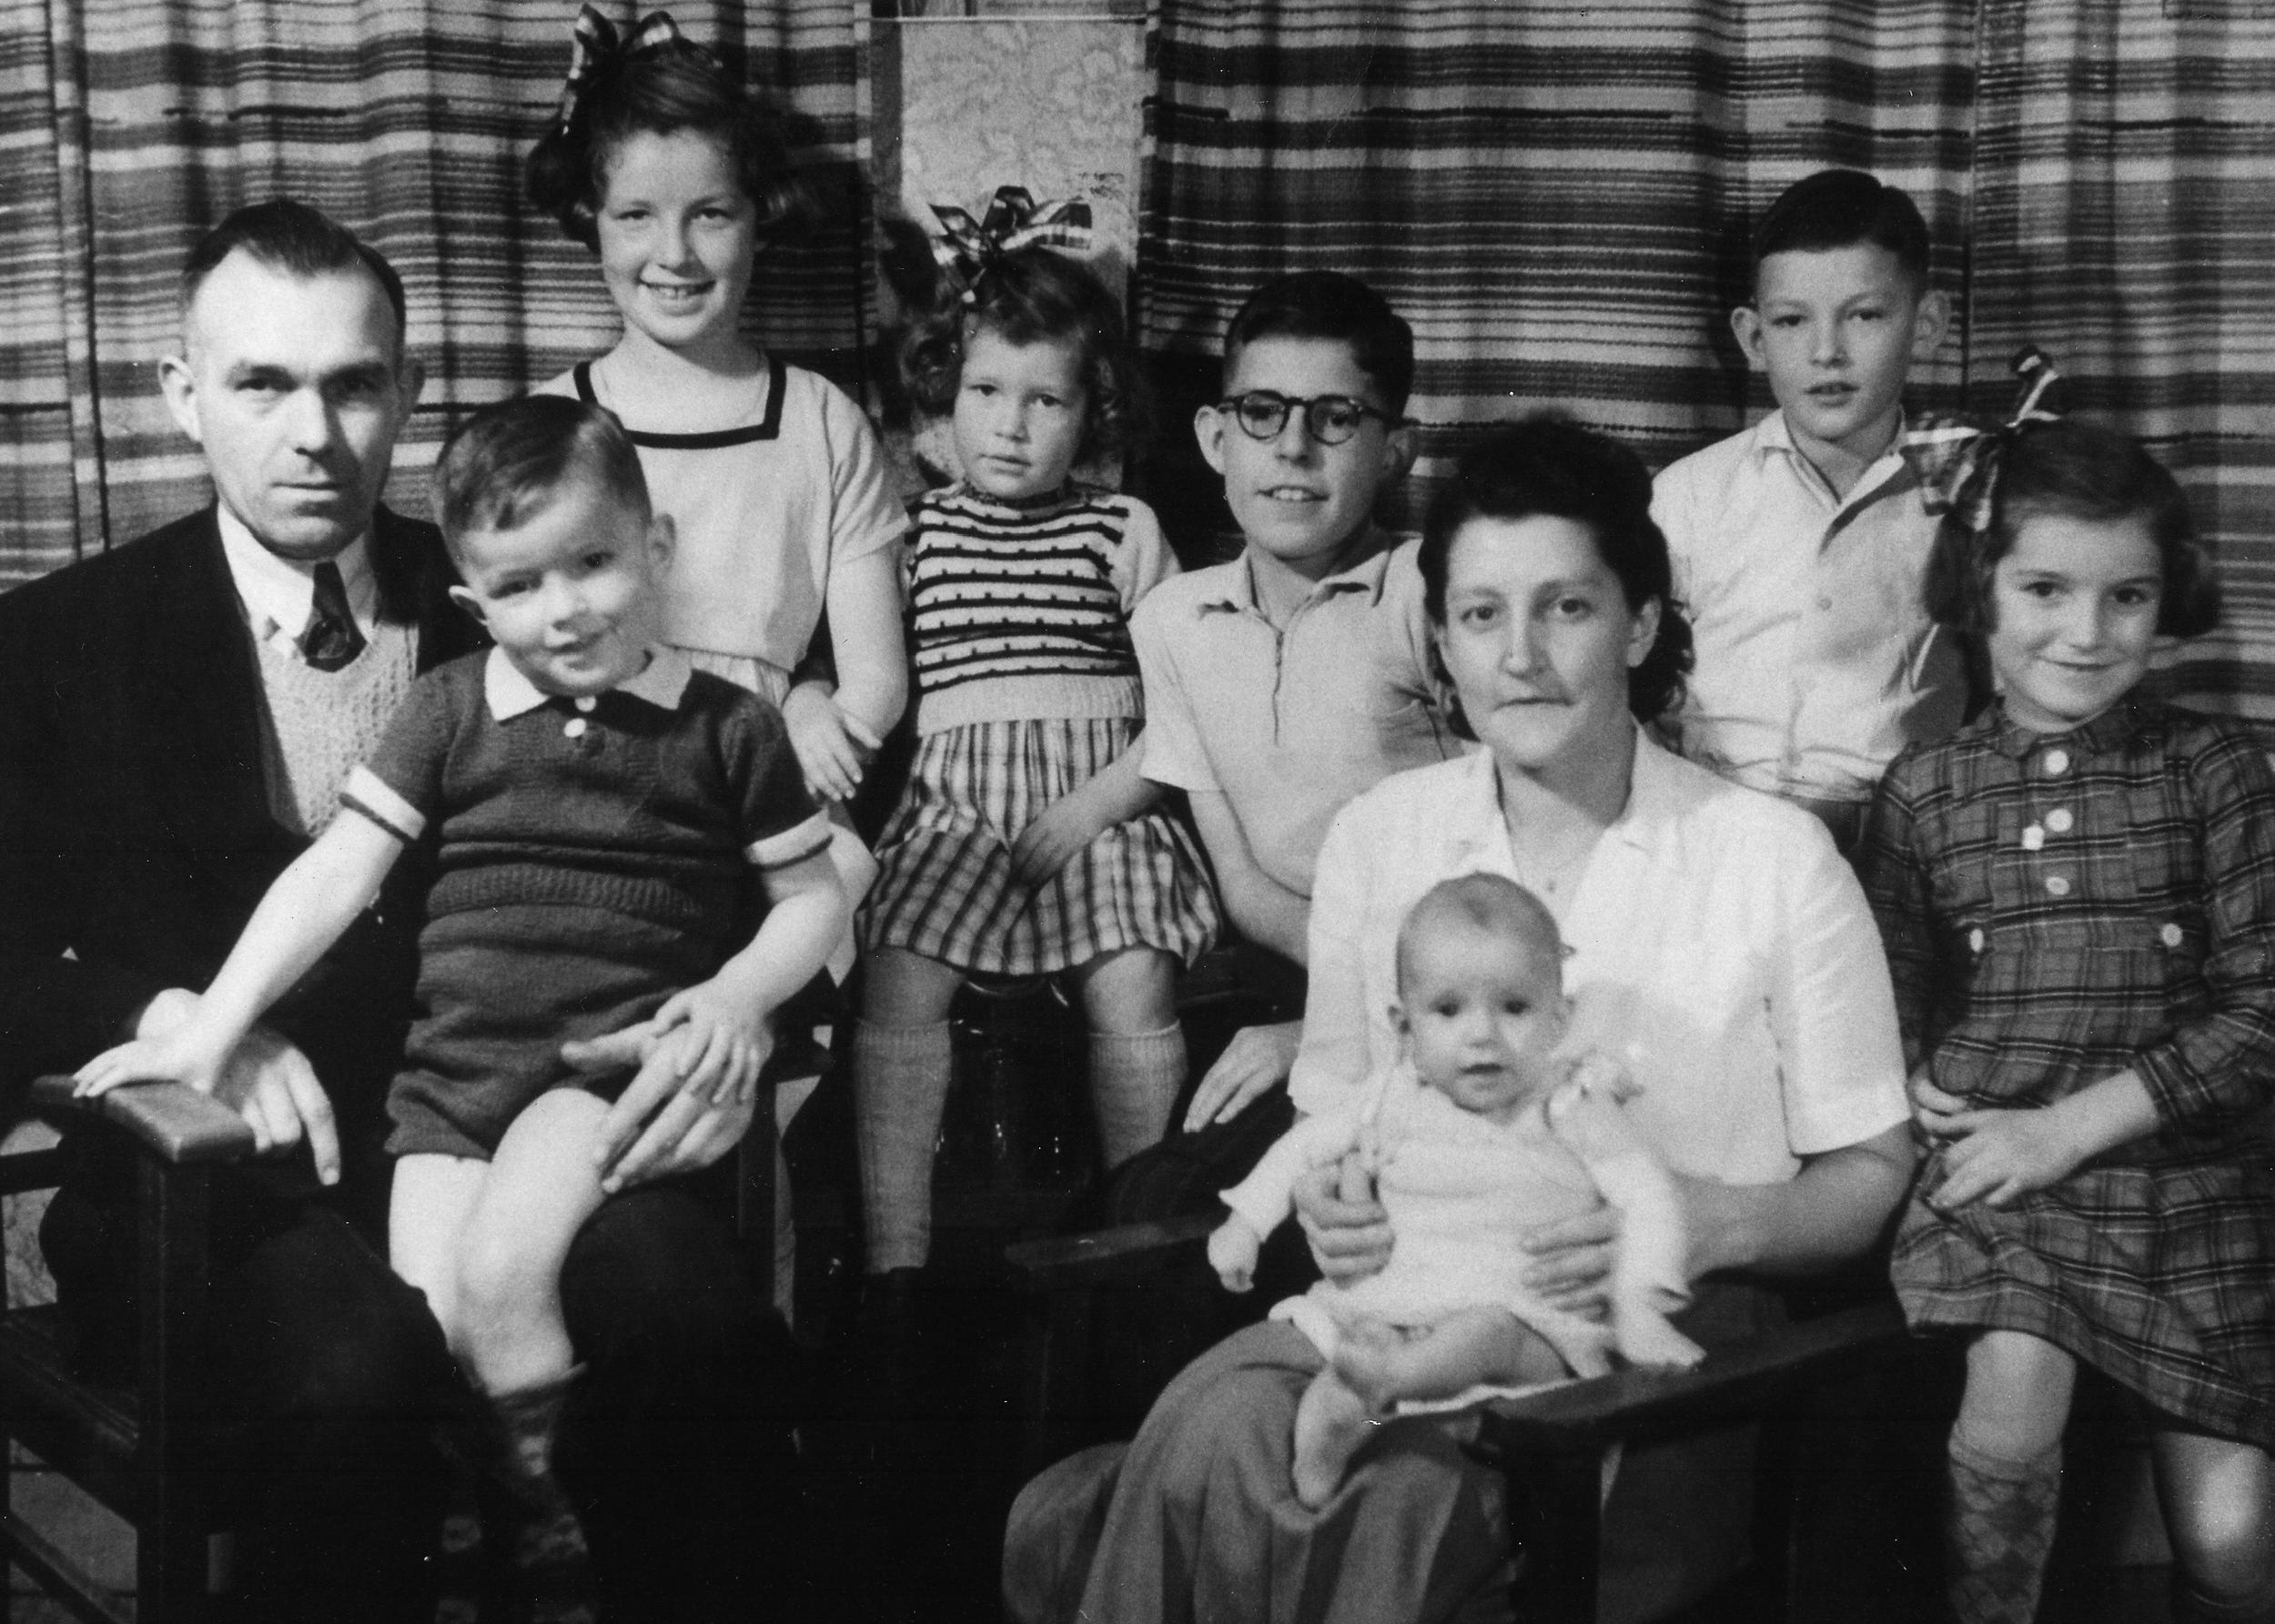 Family portrait winter 1952-53